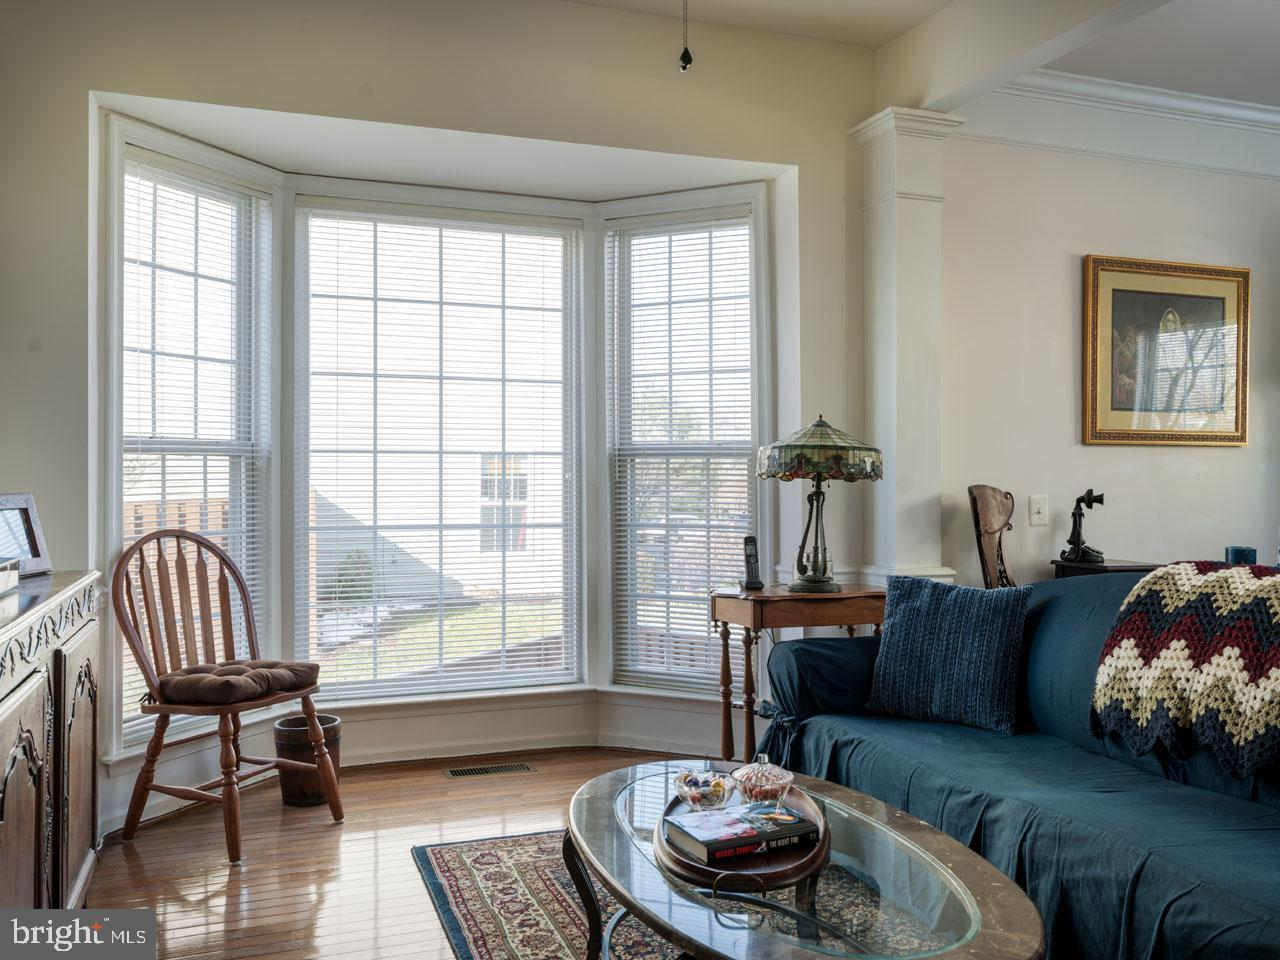 VAFX1104336-302201657634-2021-07-16-19-45-25  |   | Alexandria Delaware Real Estate For Sale | MLS# Vafx1104336  - Best of Northern Virginia